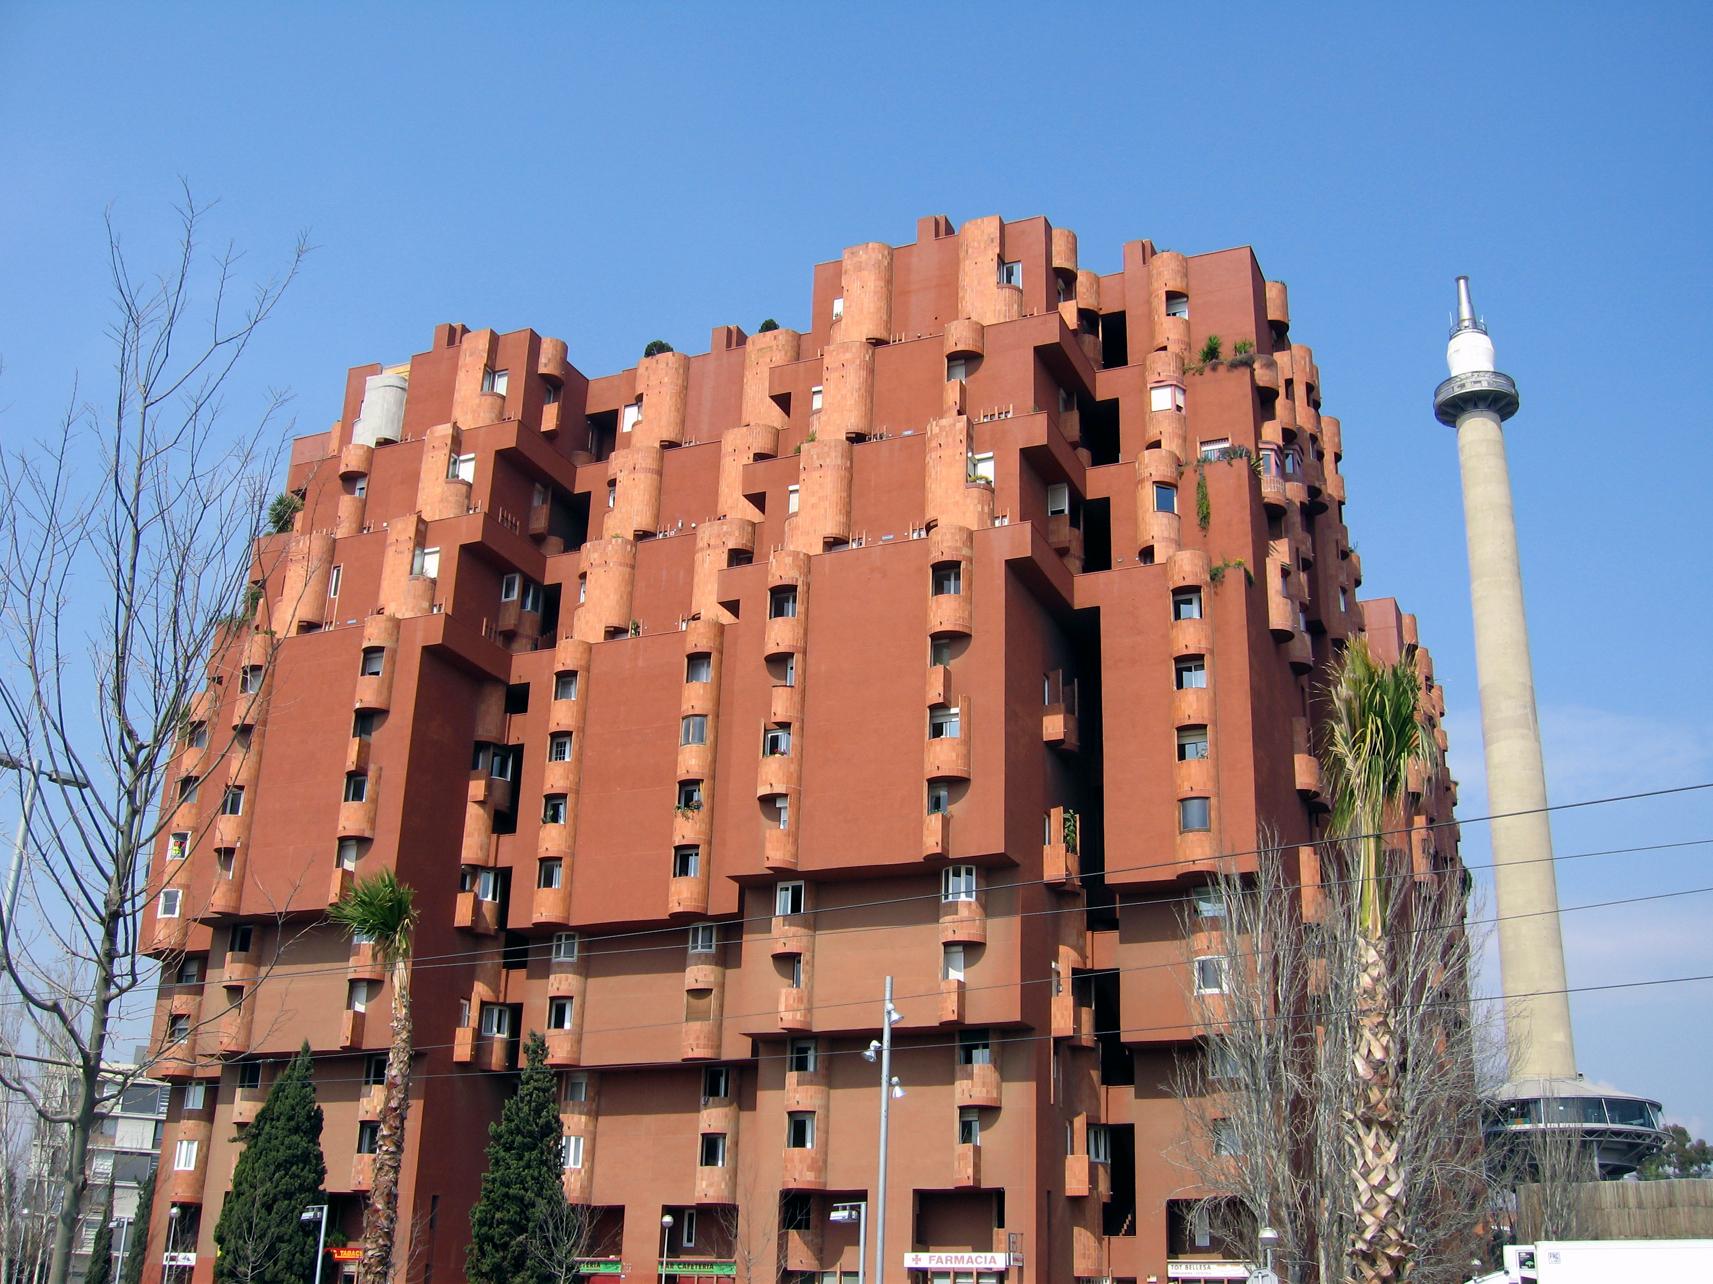 Walden 7 wikipedia la enciclopedia libre - Arquitectura barcelona ...